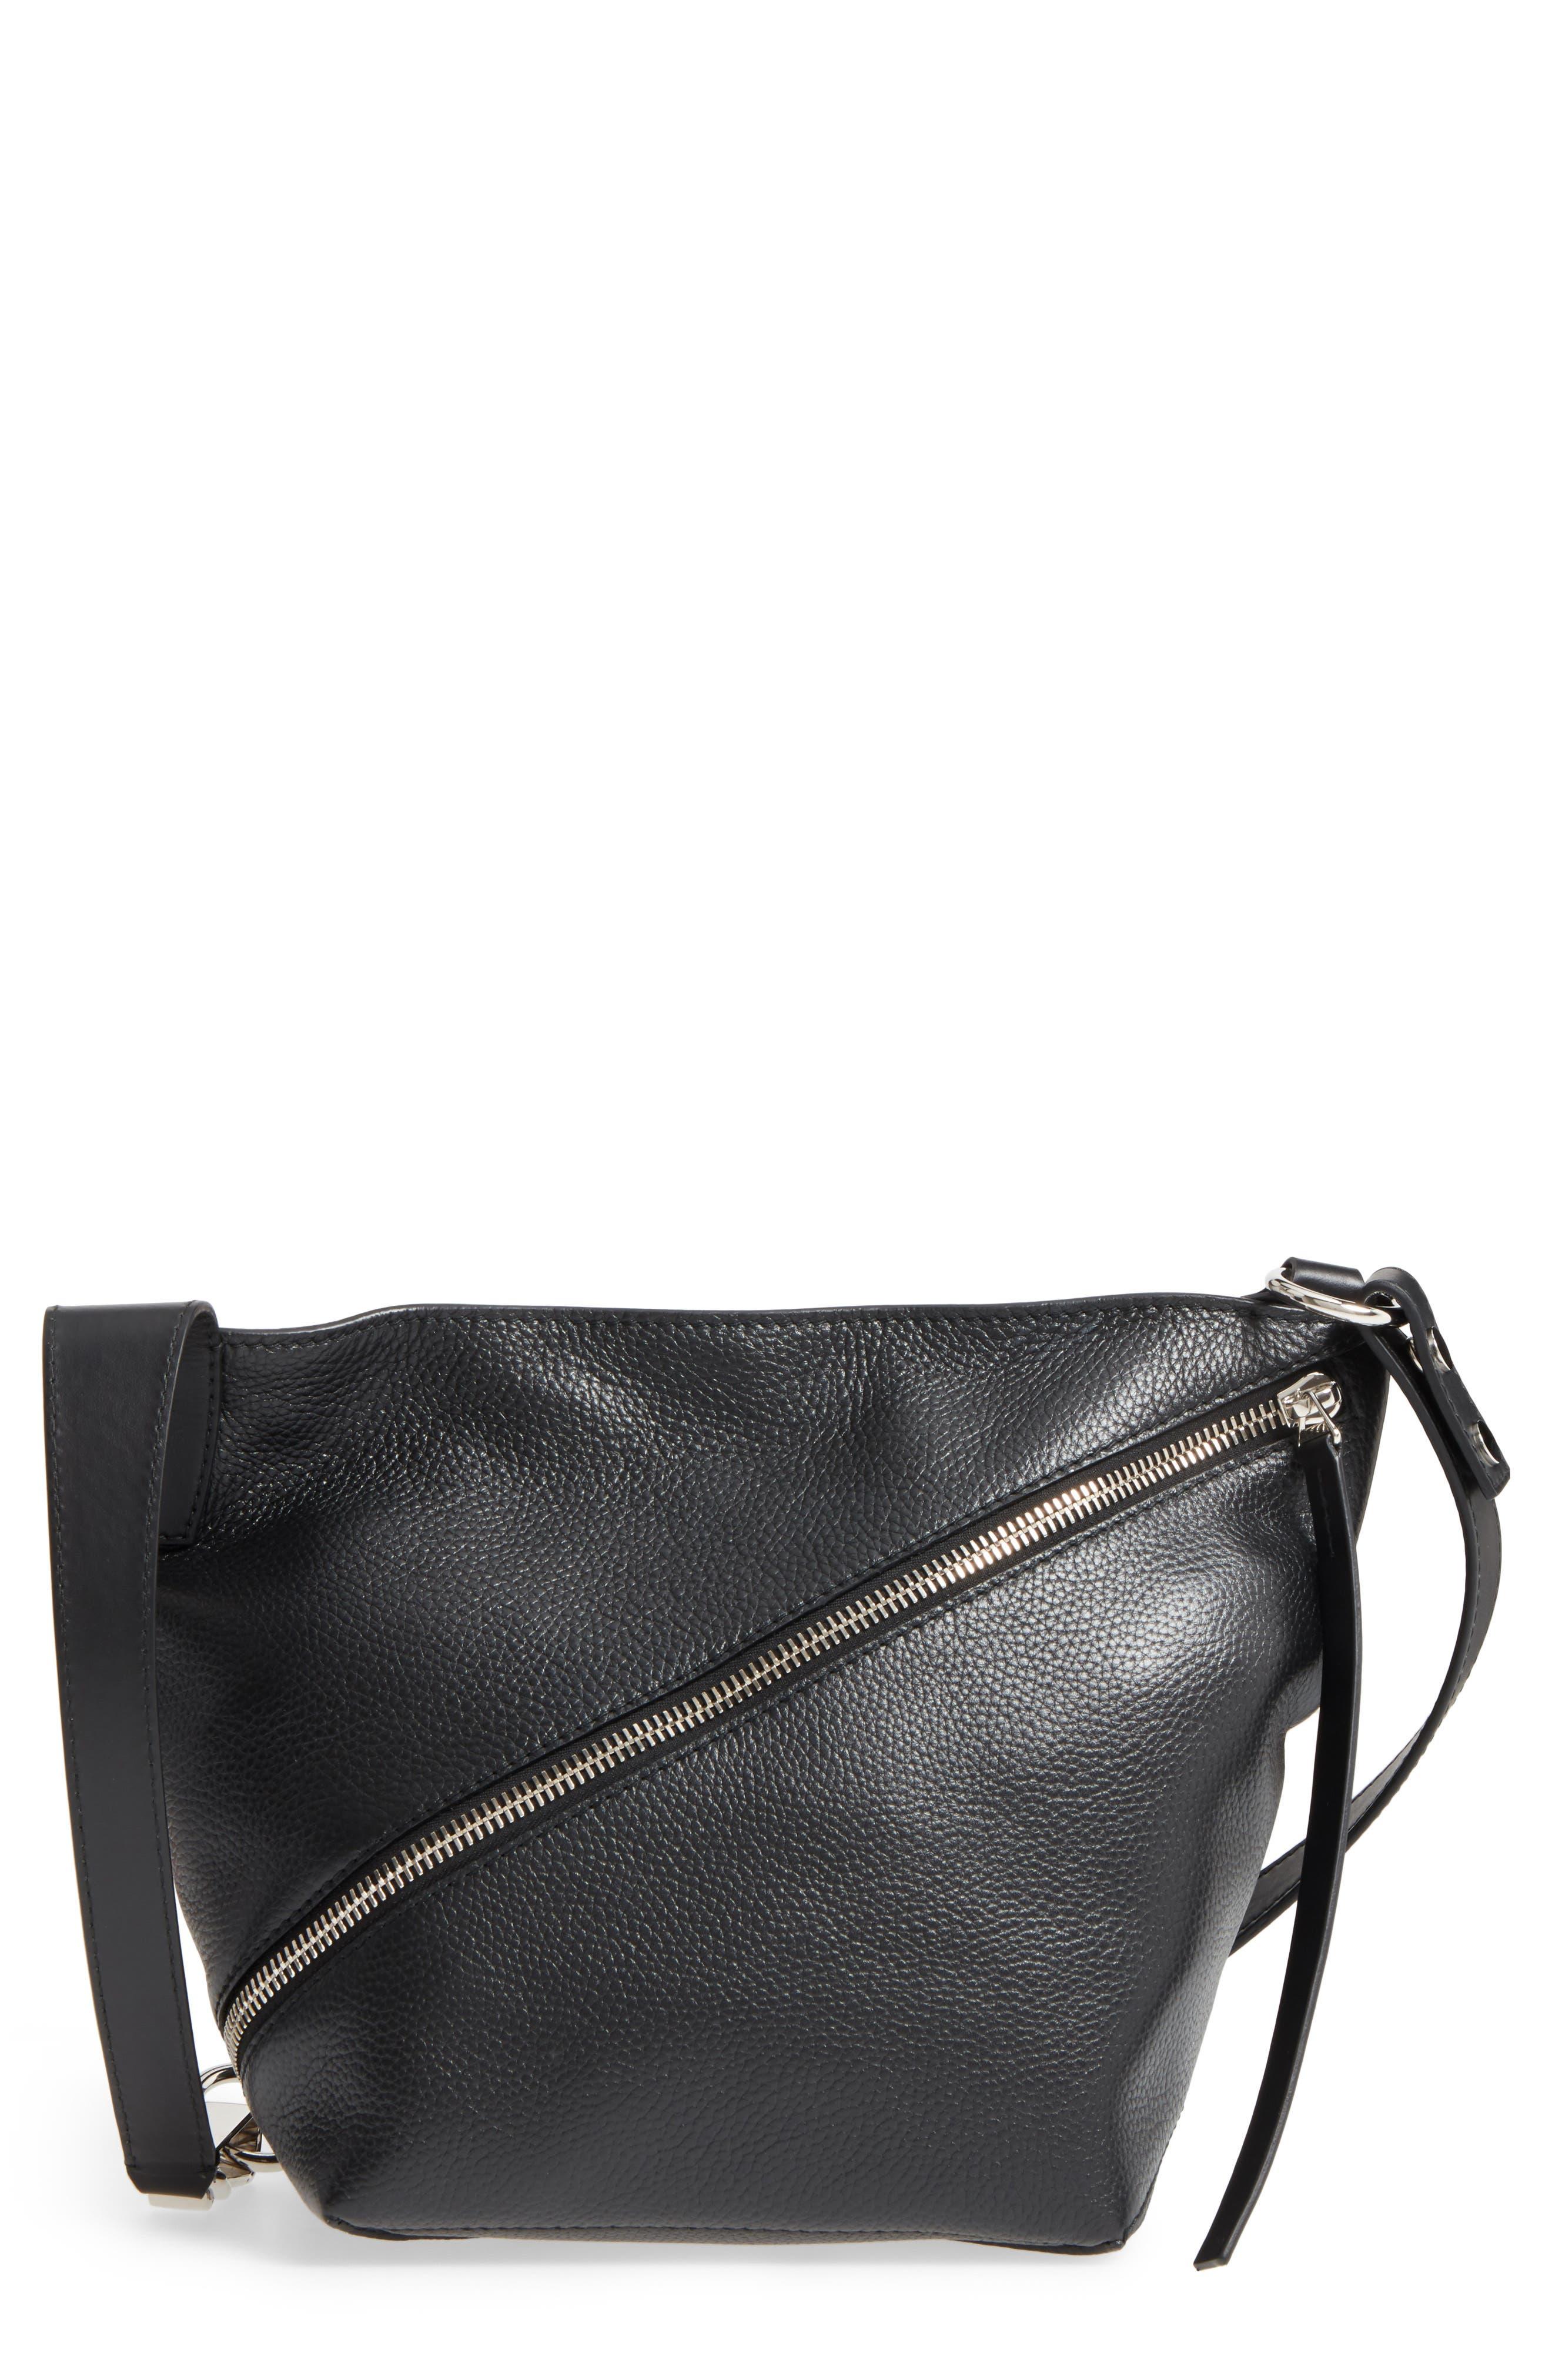 Proenza Schouler Small Leather Hobo Bag